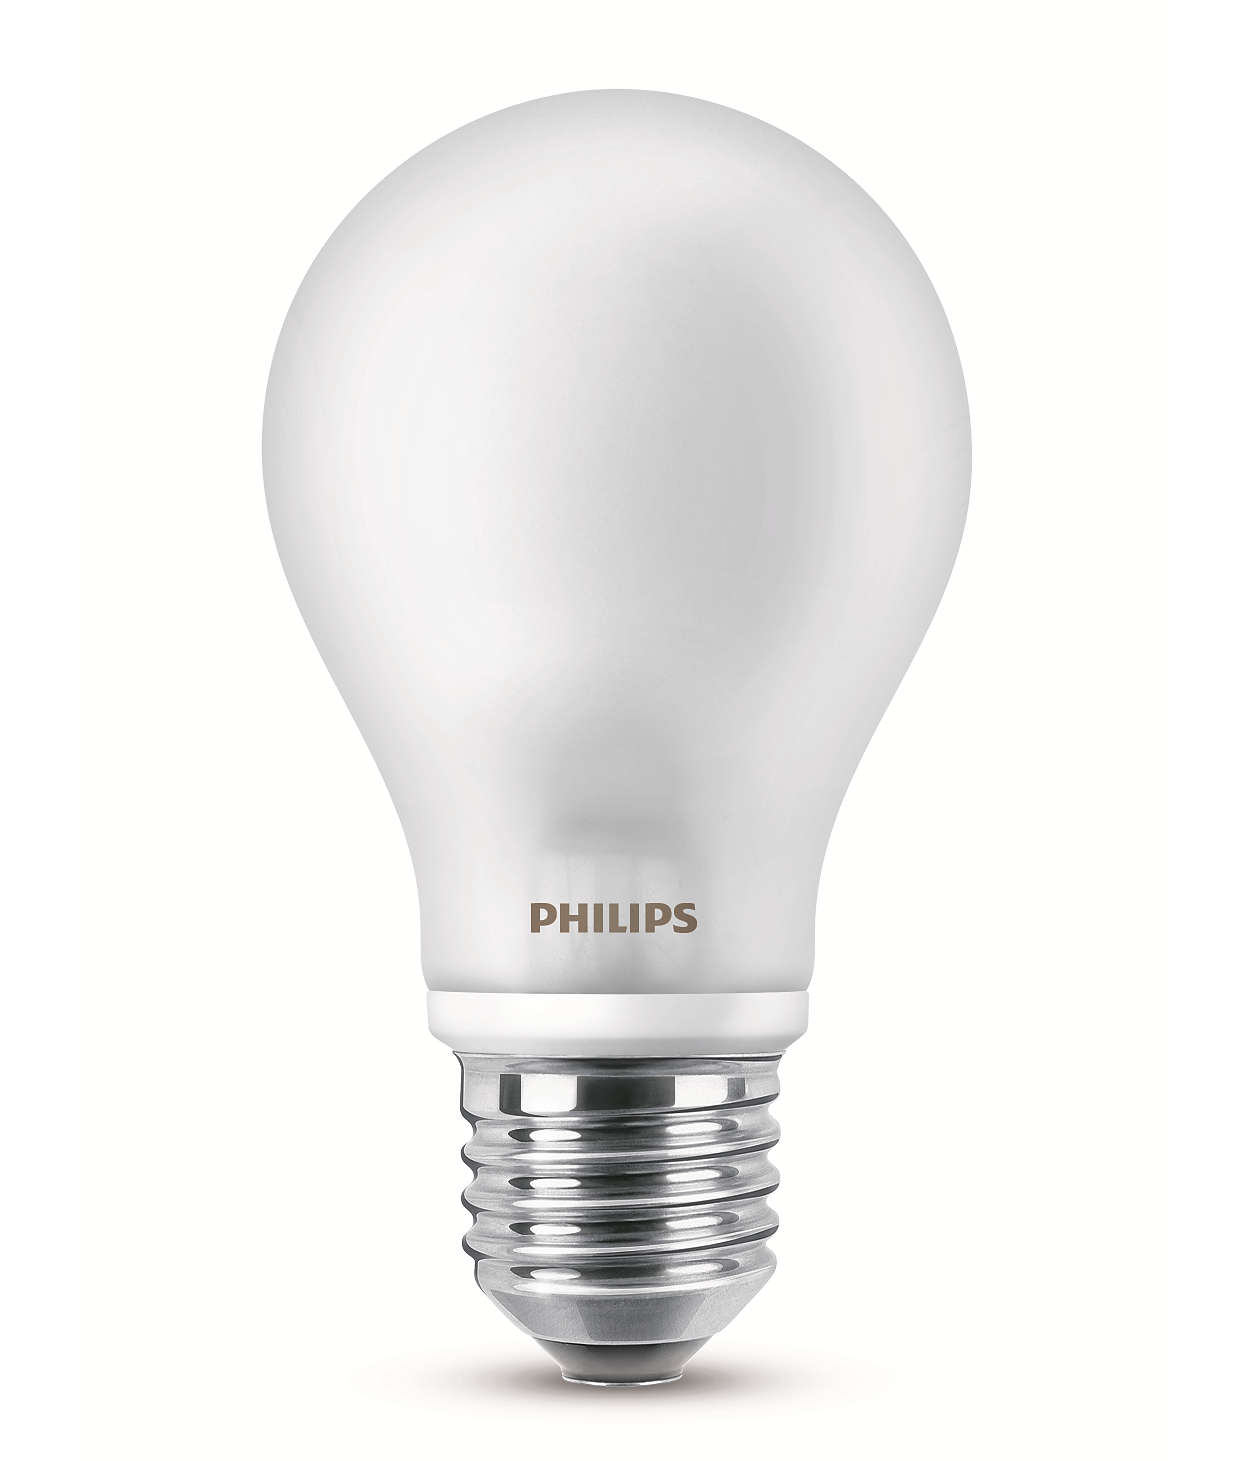 led ampoule 8718696422328 philips. Black Bedroom Furniture Sets. Home Design Ideas